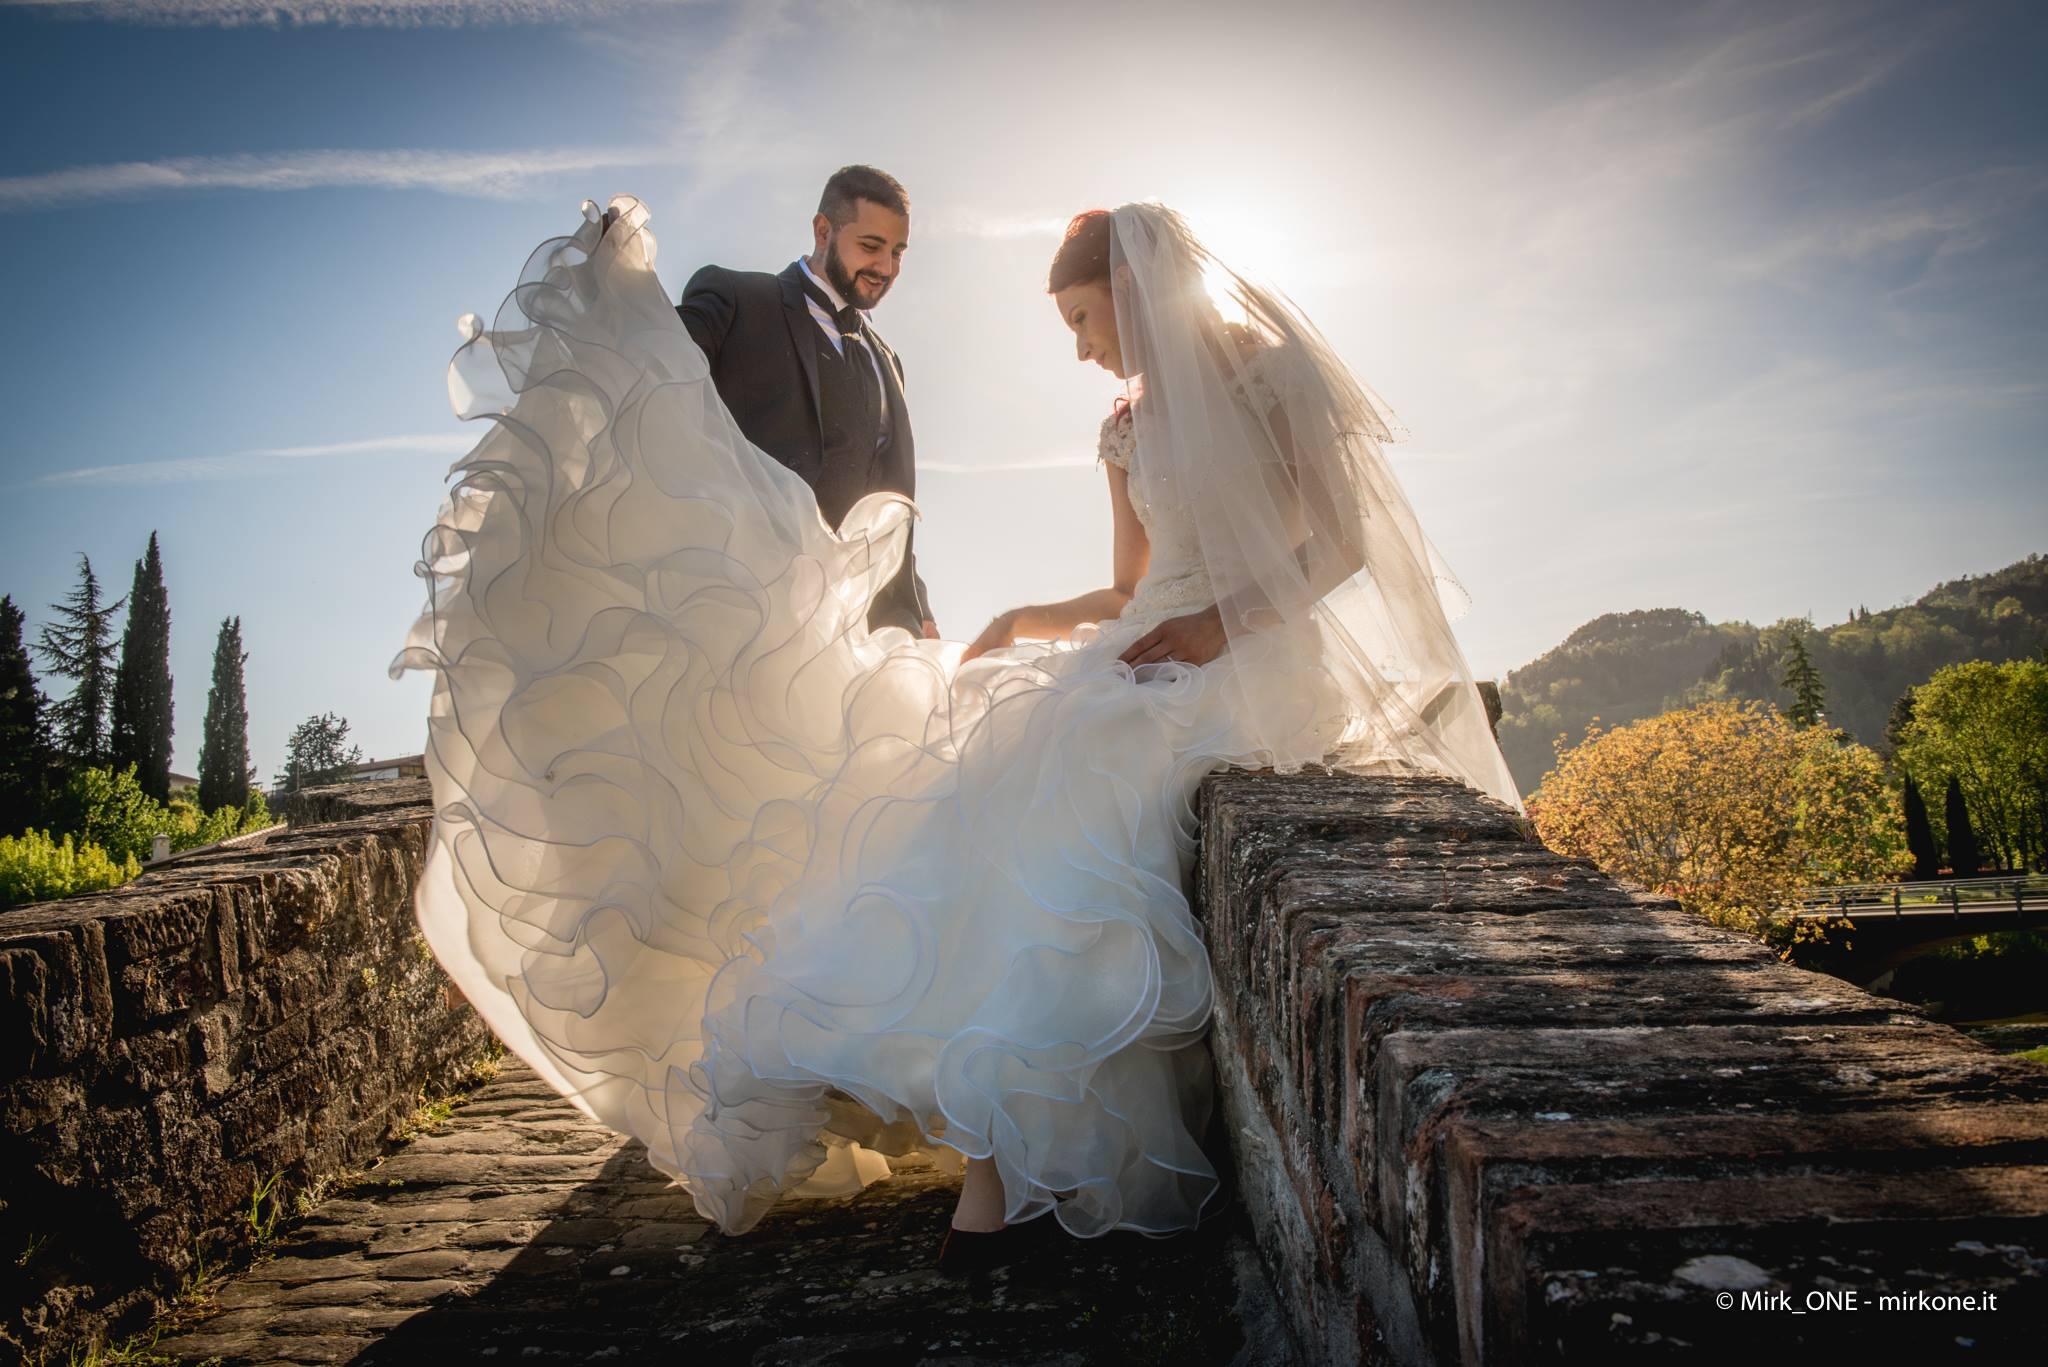 https://lnx.mirkone.it/wp-content/uploads/2015/07/mirk_ONE-fotografo-matrimonio-00803.jpg